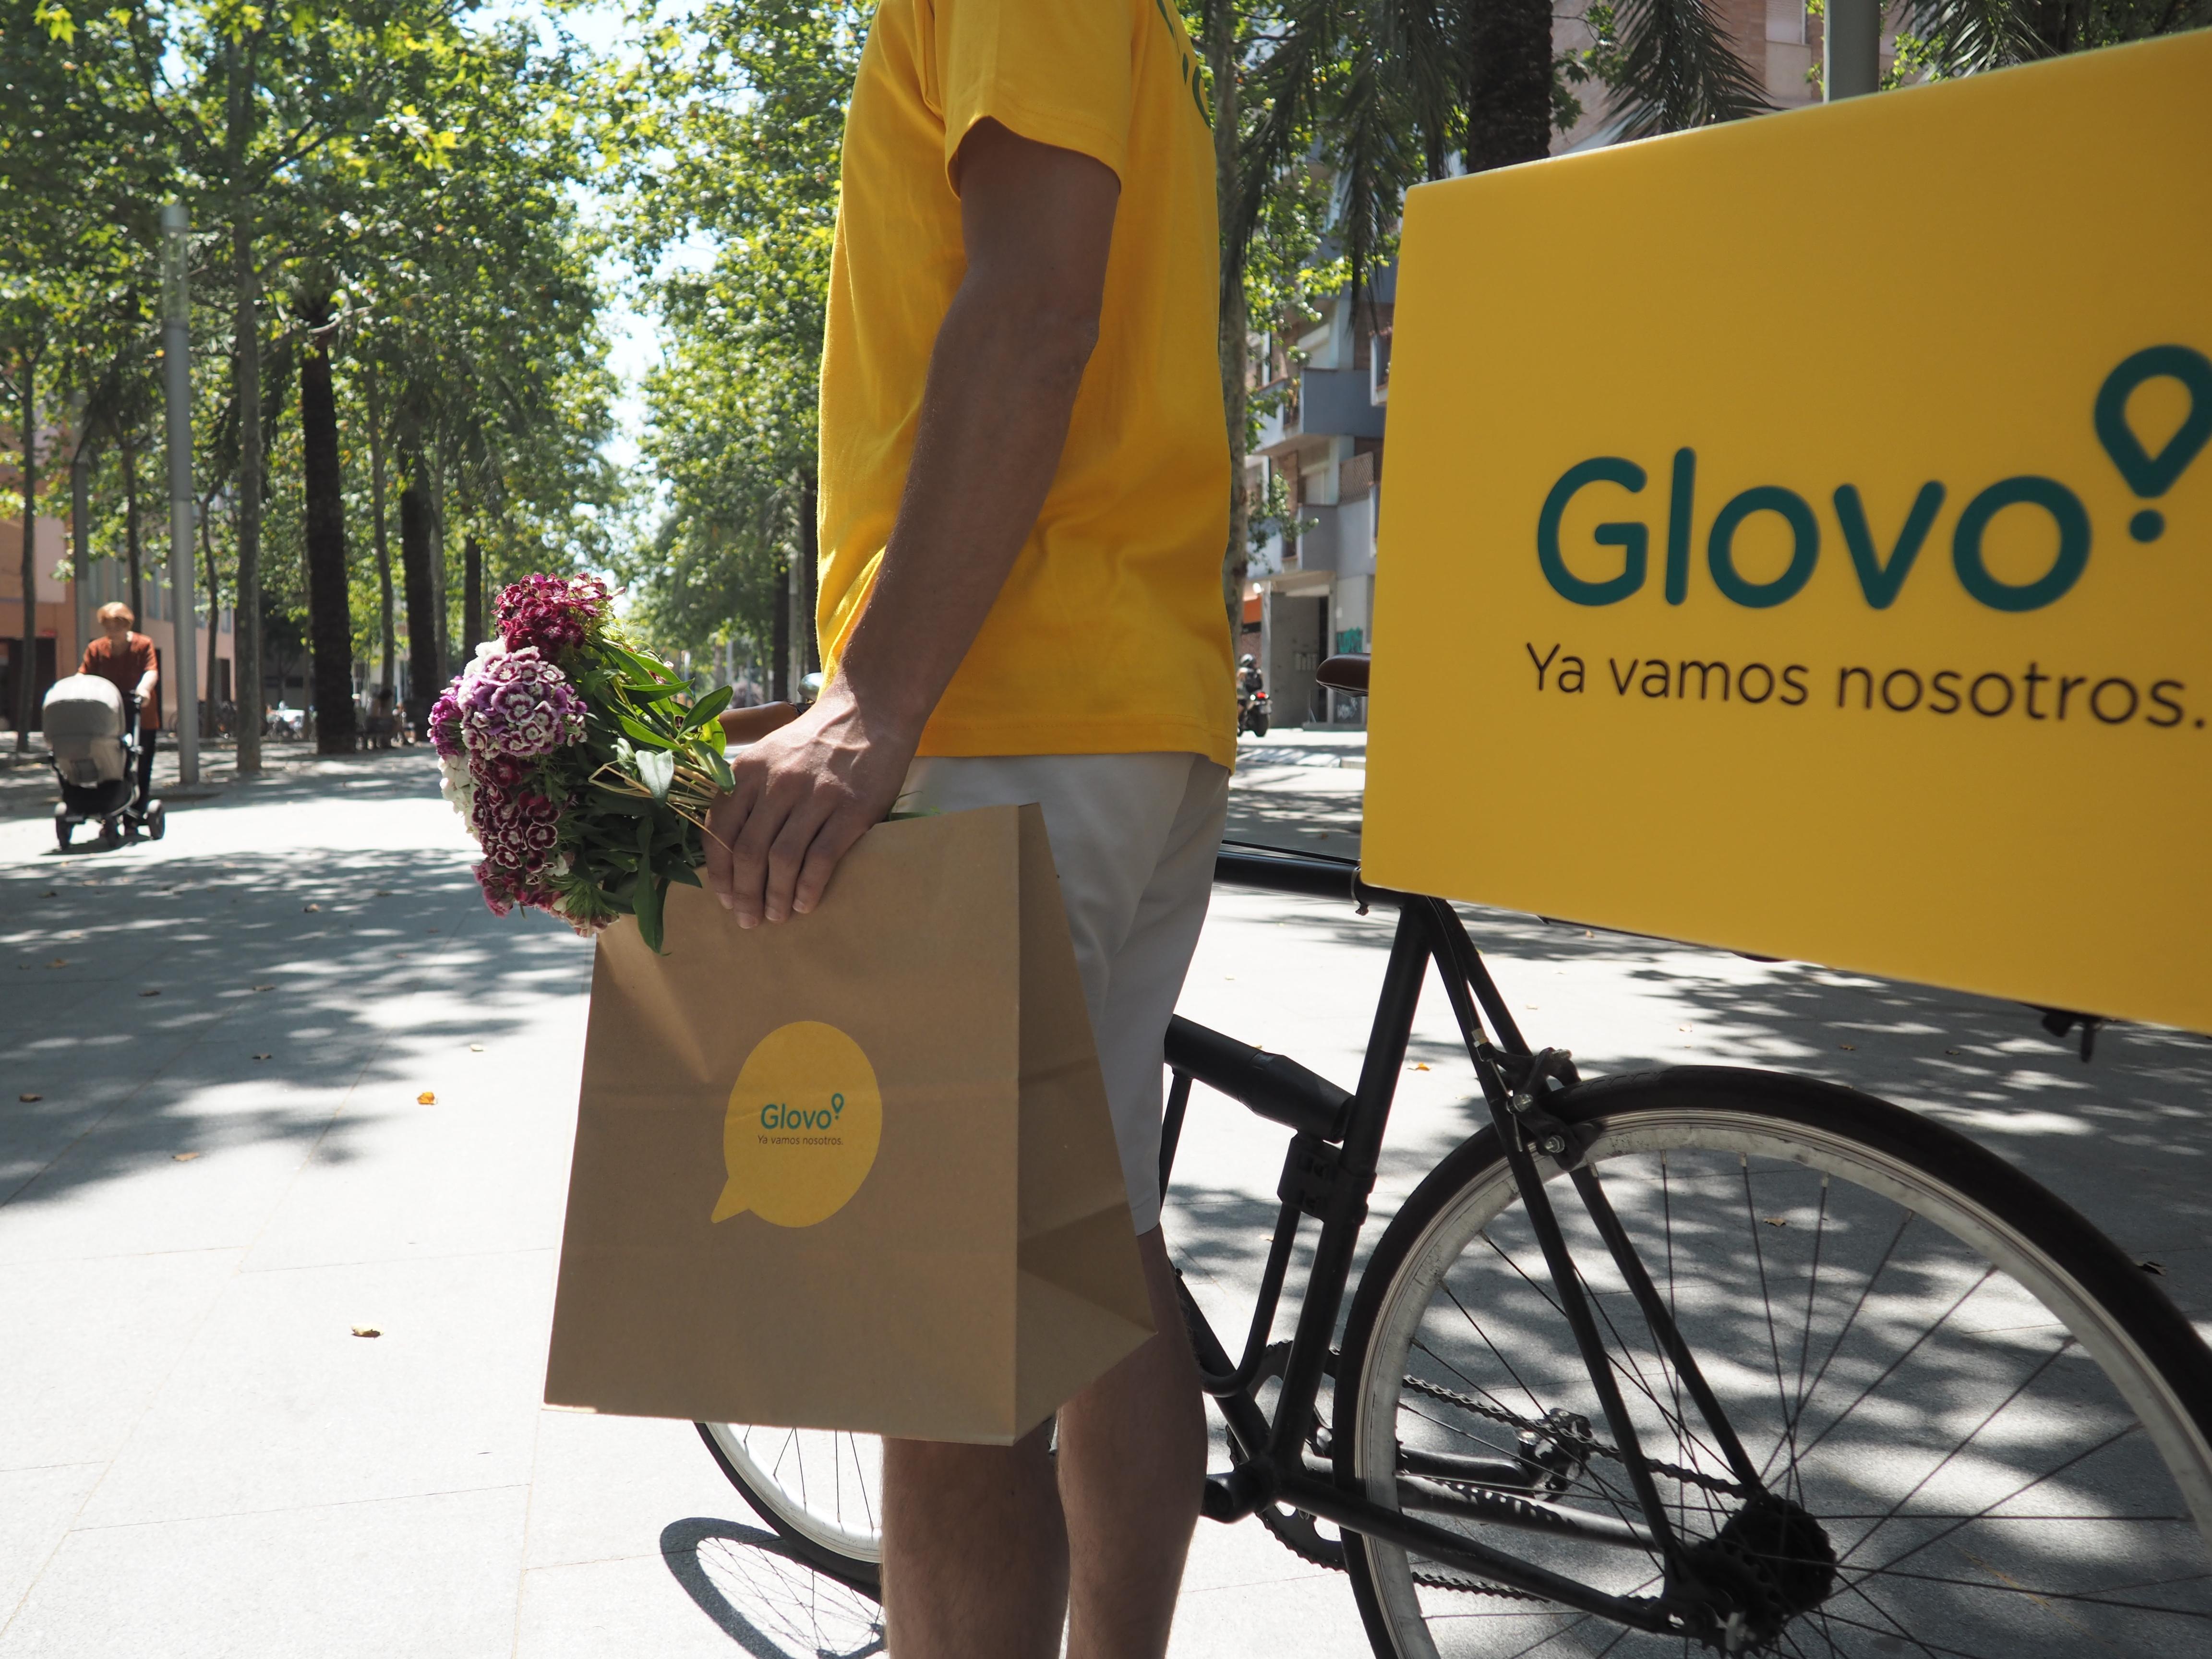 European on-demand delivery startup Glovo raises €30 million Series B